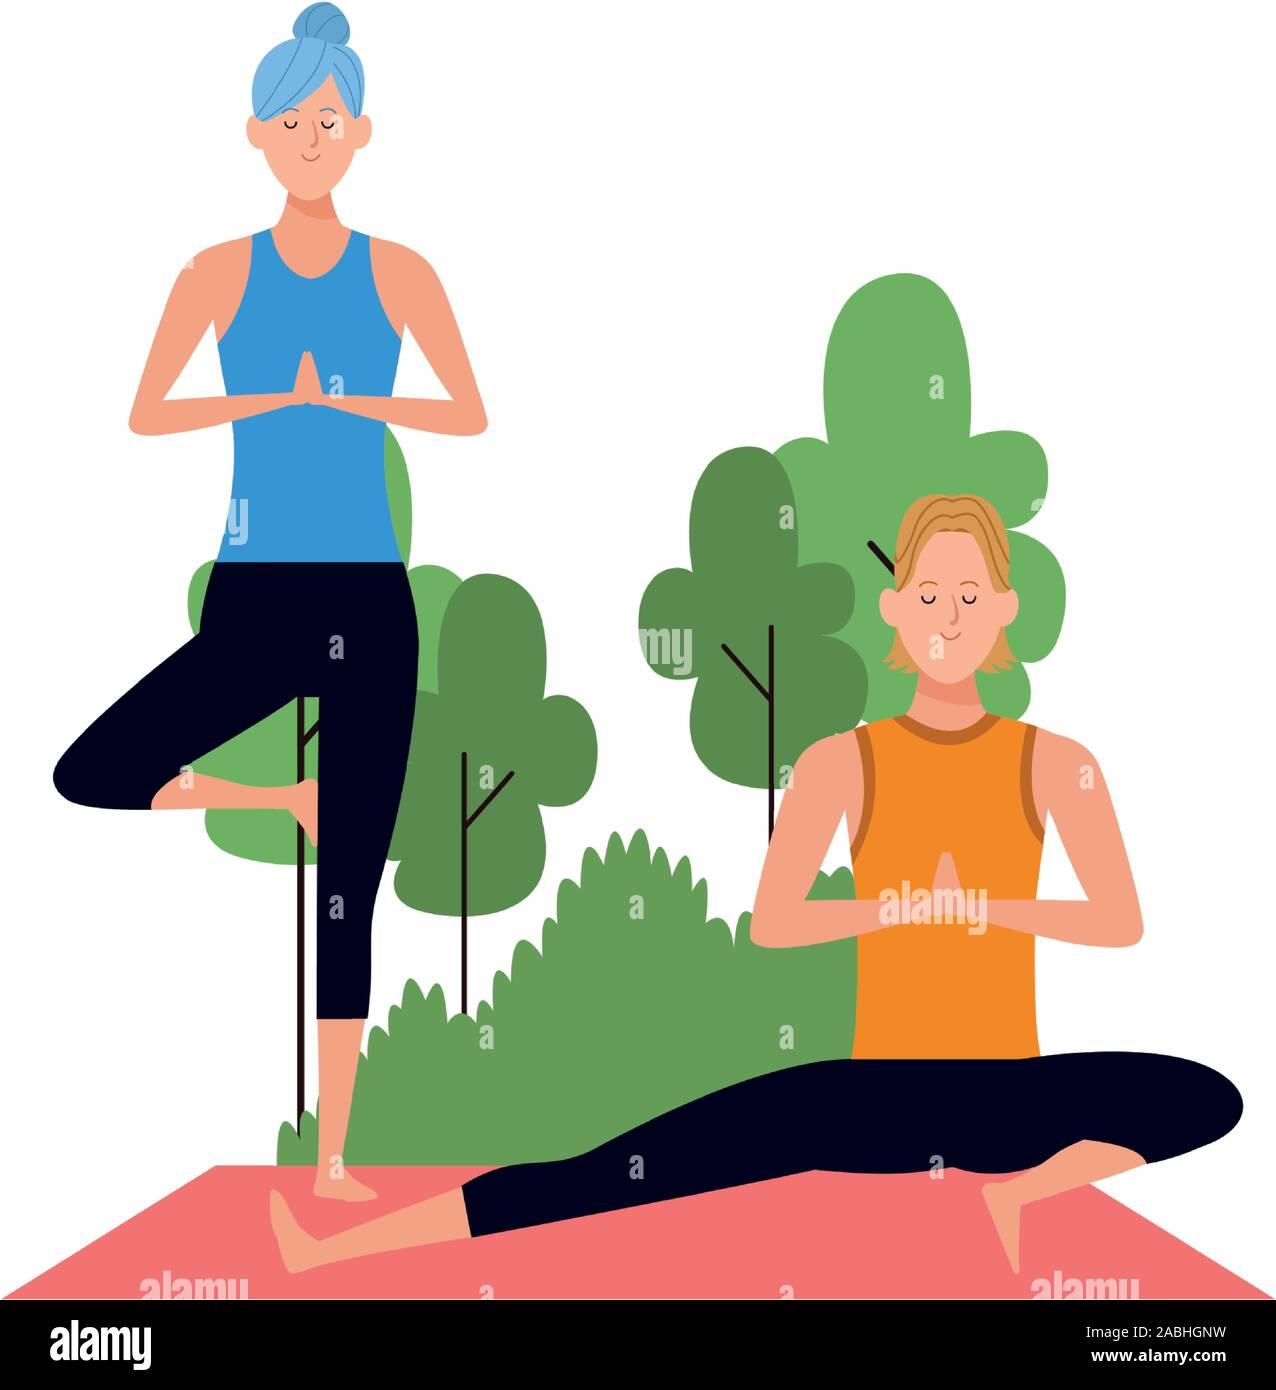 Cartoon Man And Woman Doing Yoga Poses At Outdoors Stock Vector Image Art Alamy